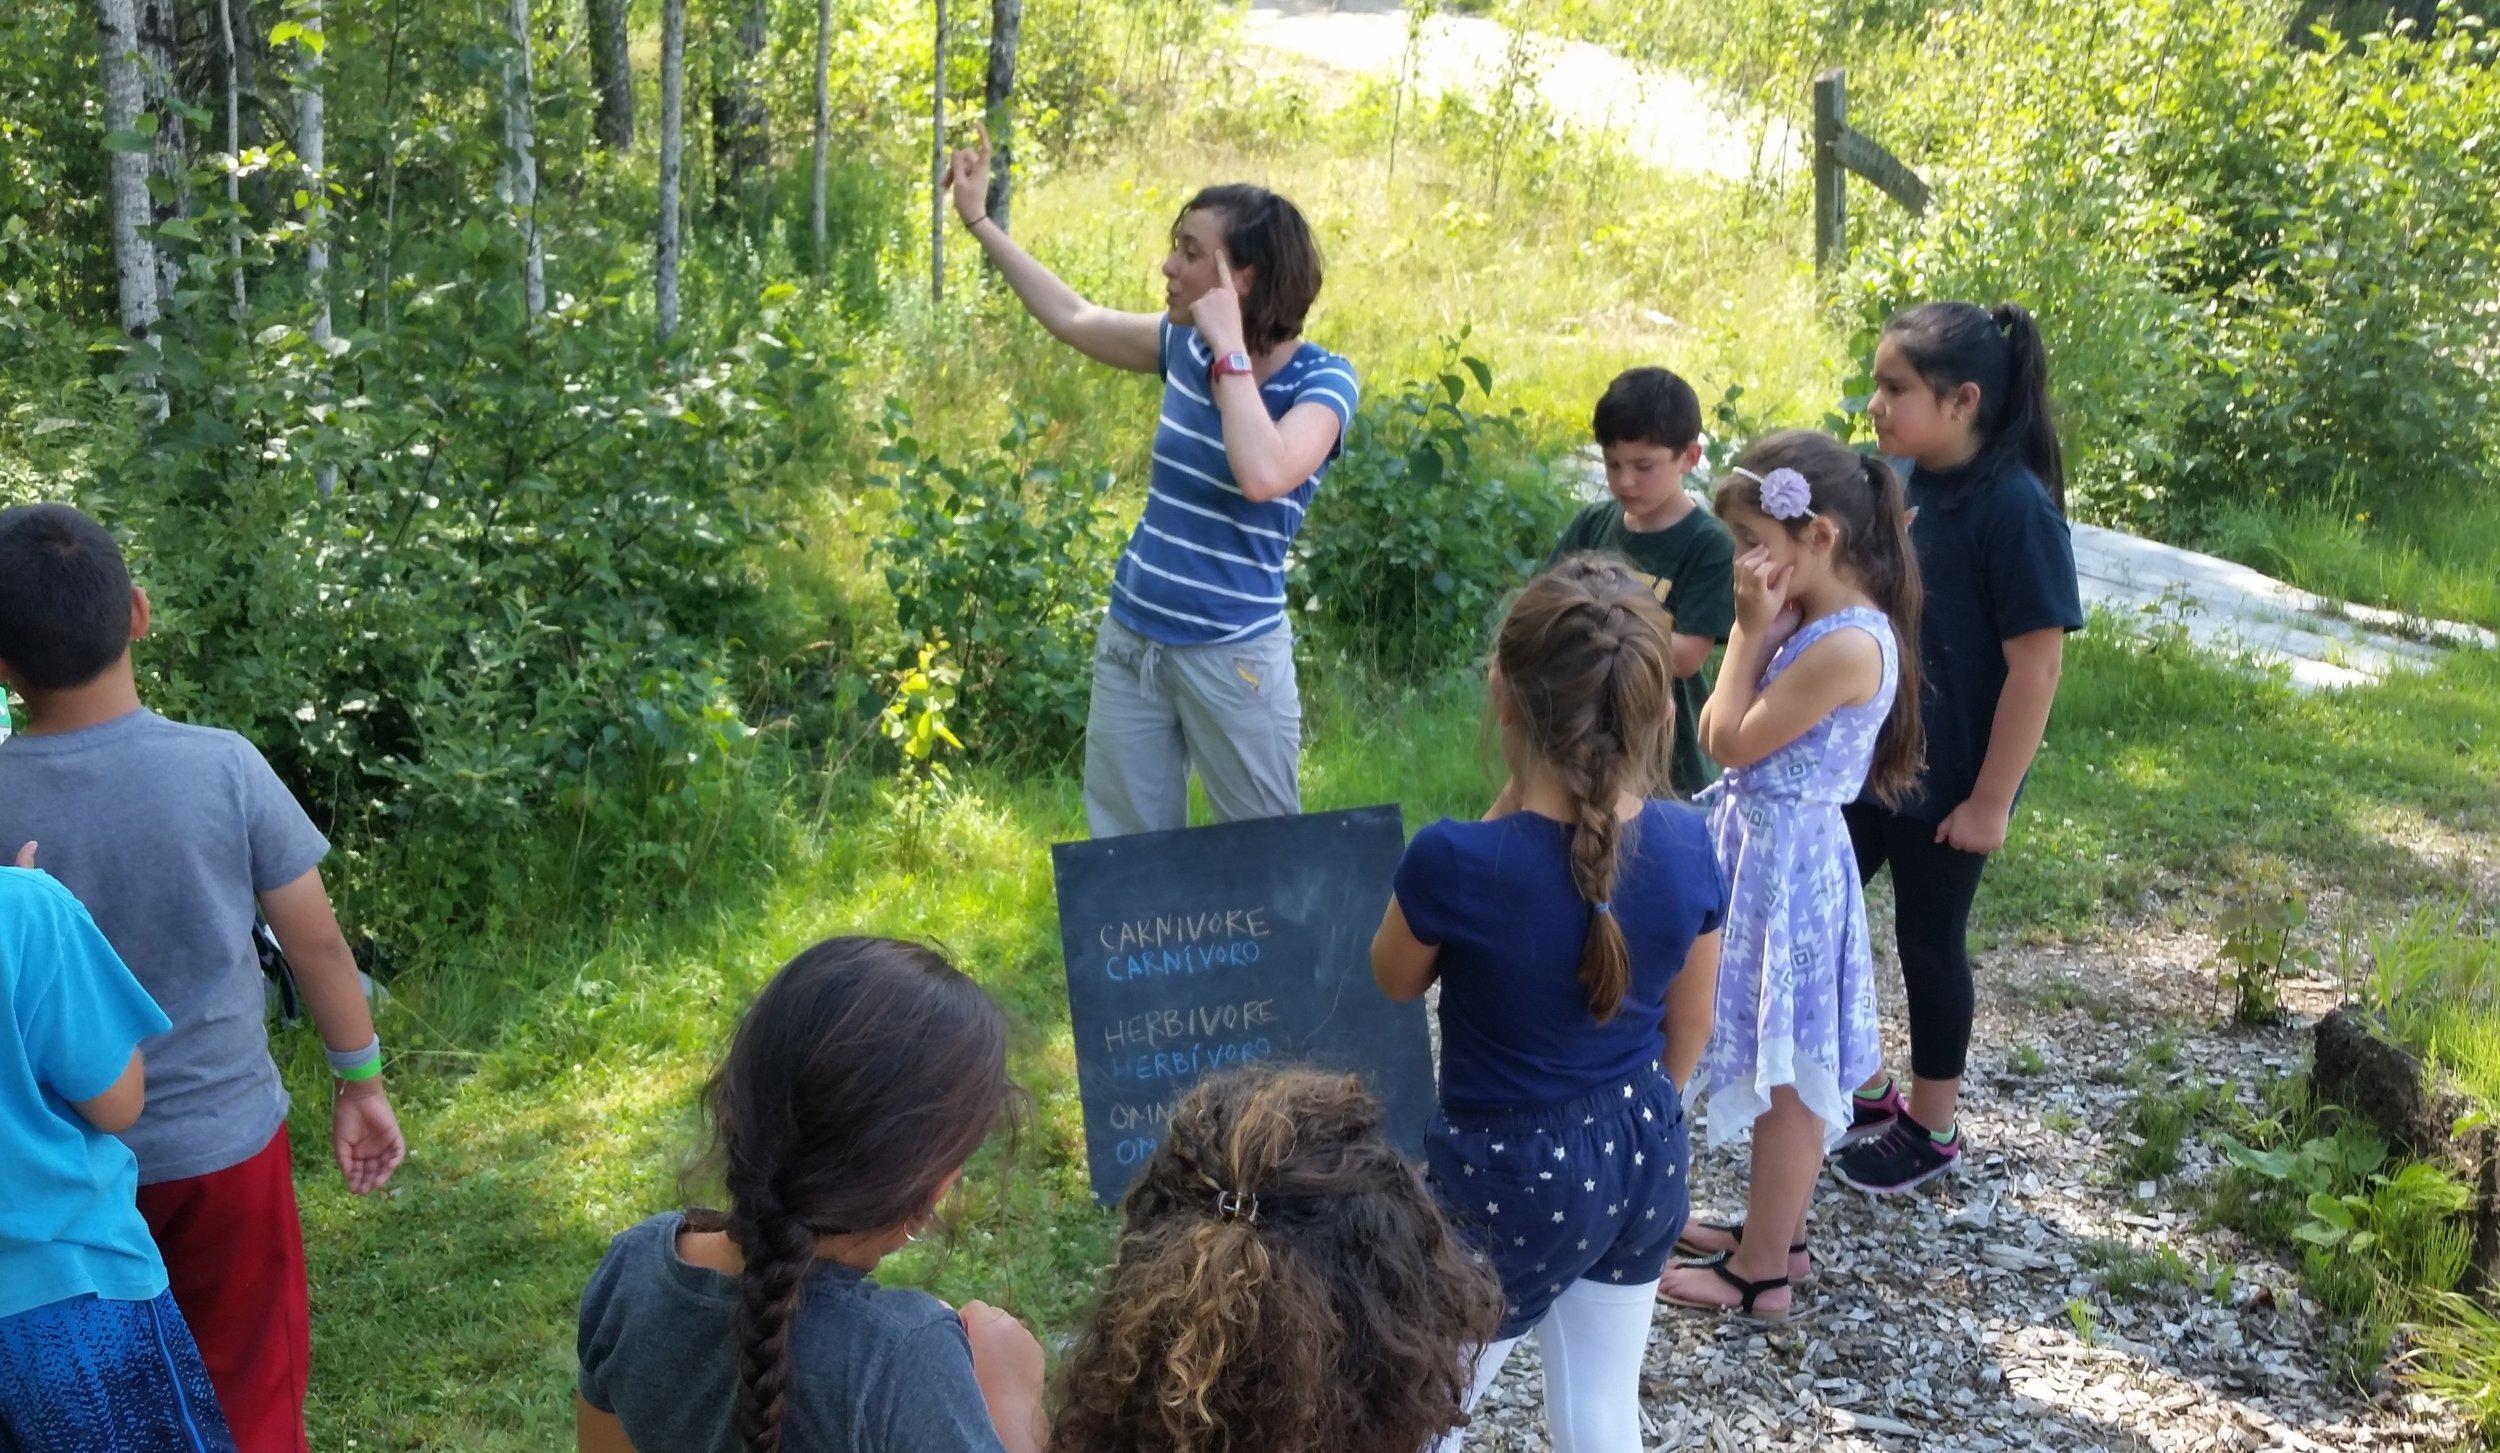 Ellie teaching about carnivores, omnivores, and herbivores at Blueberry Harvest School